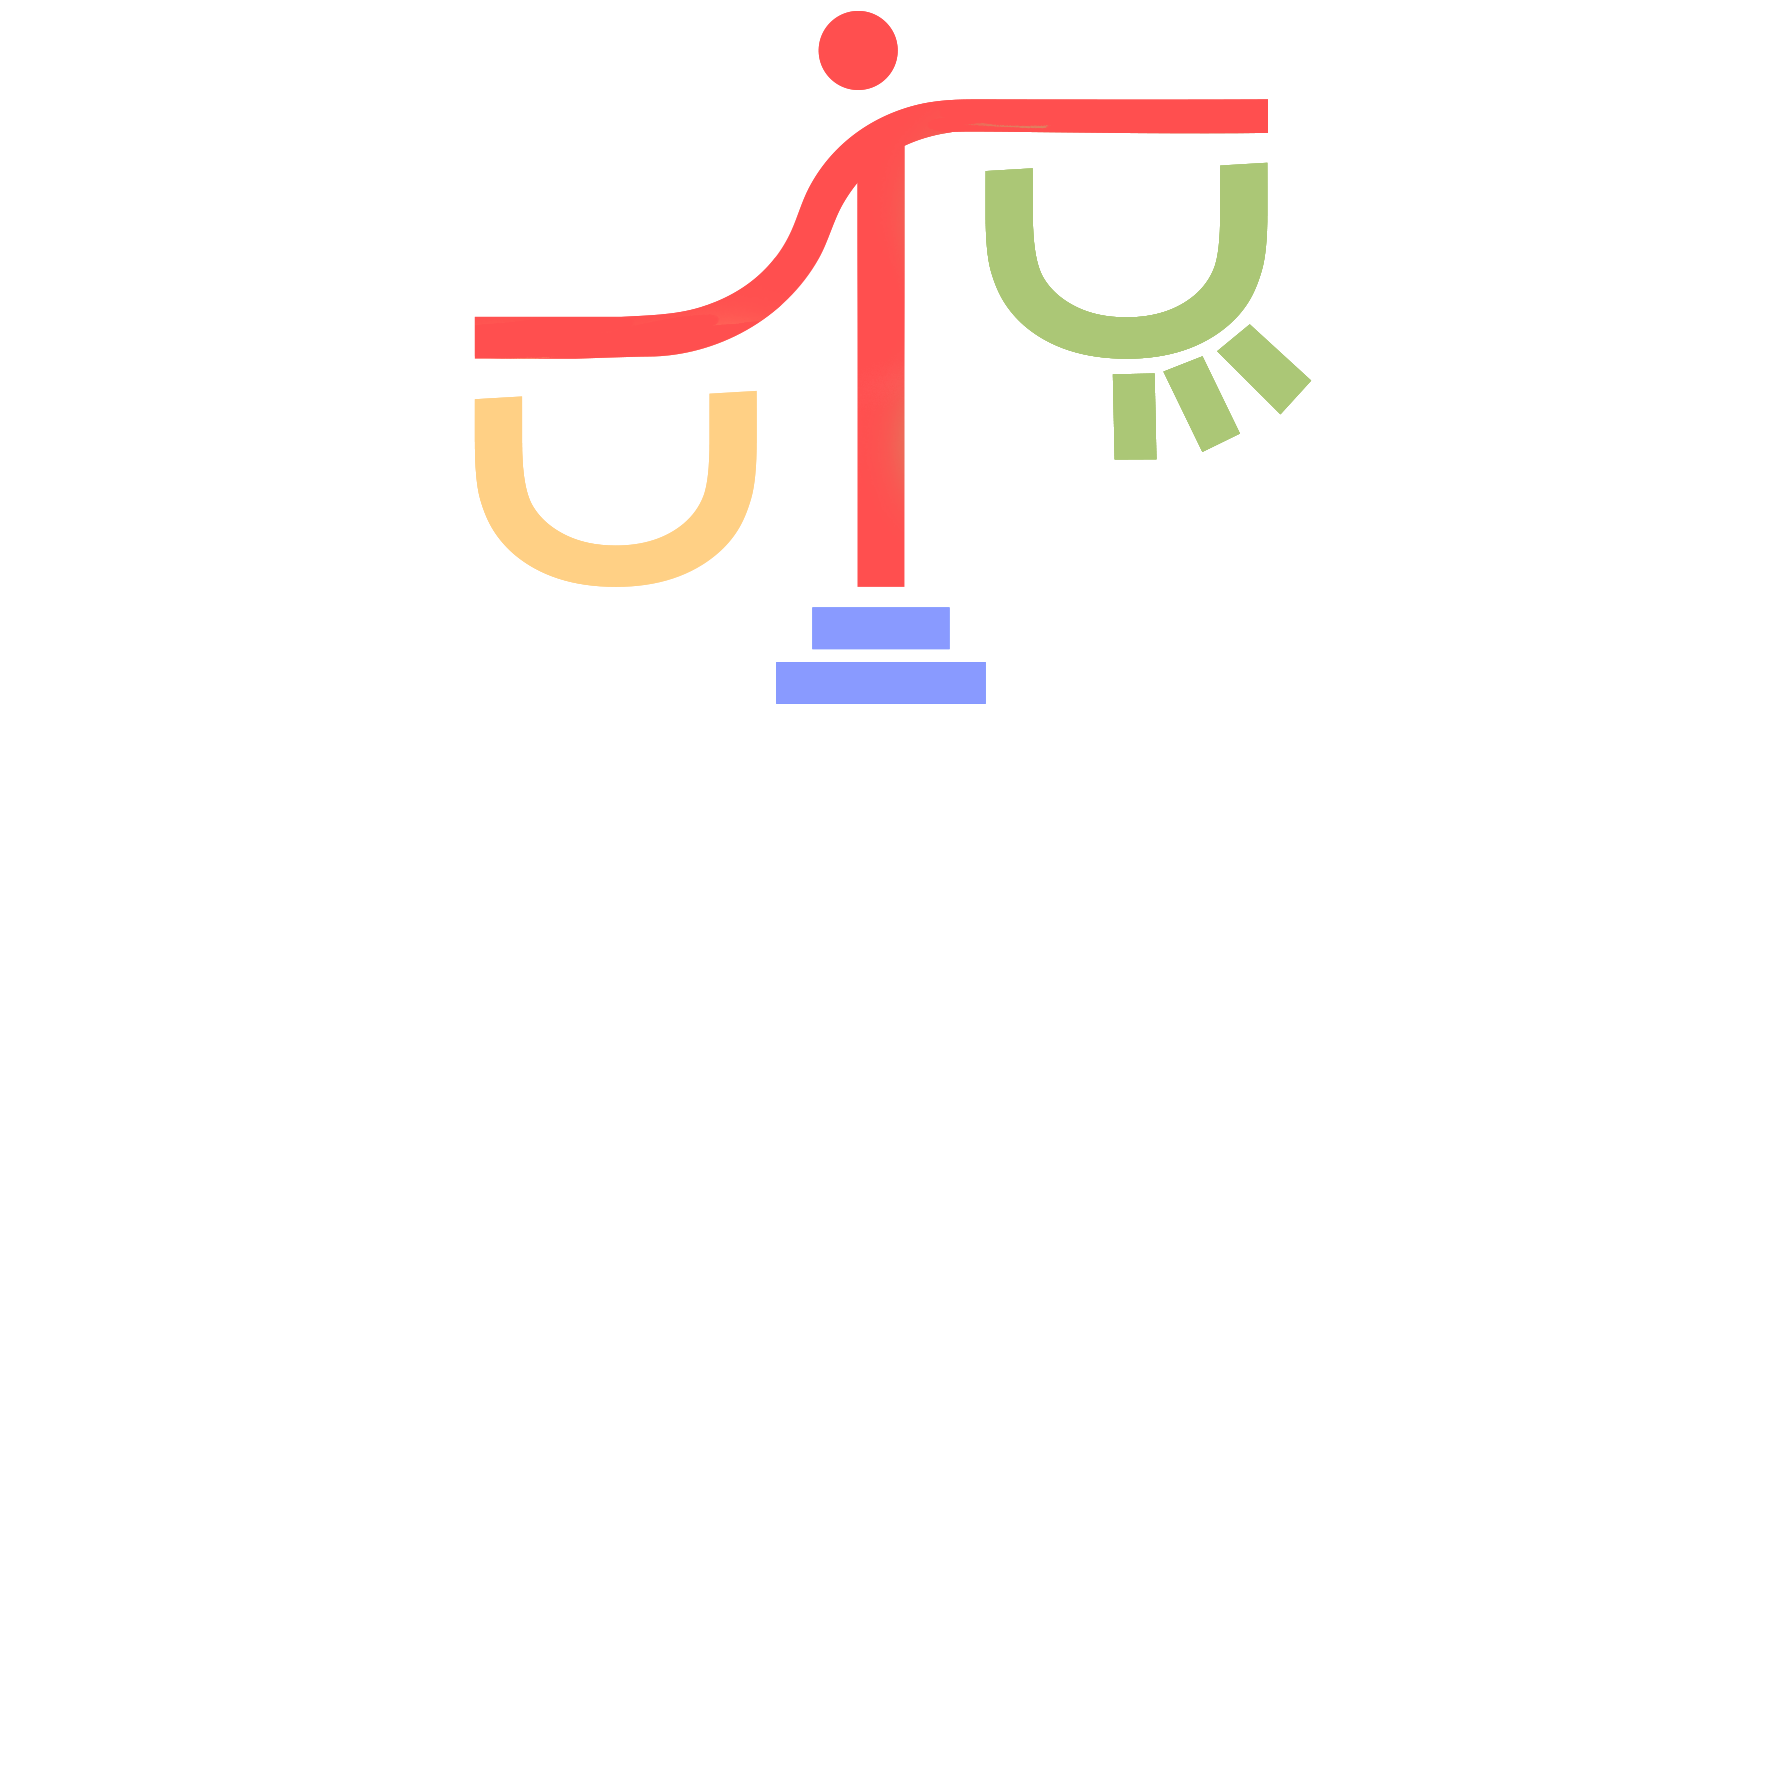 Teatro Giuseppe Verdi Muggia (TS)